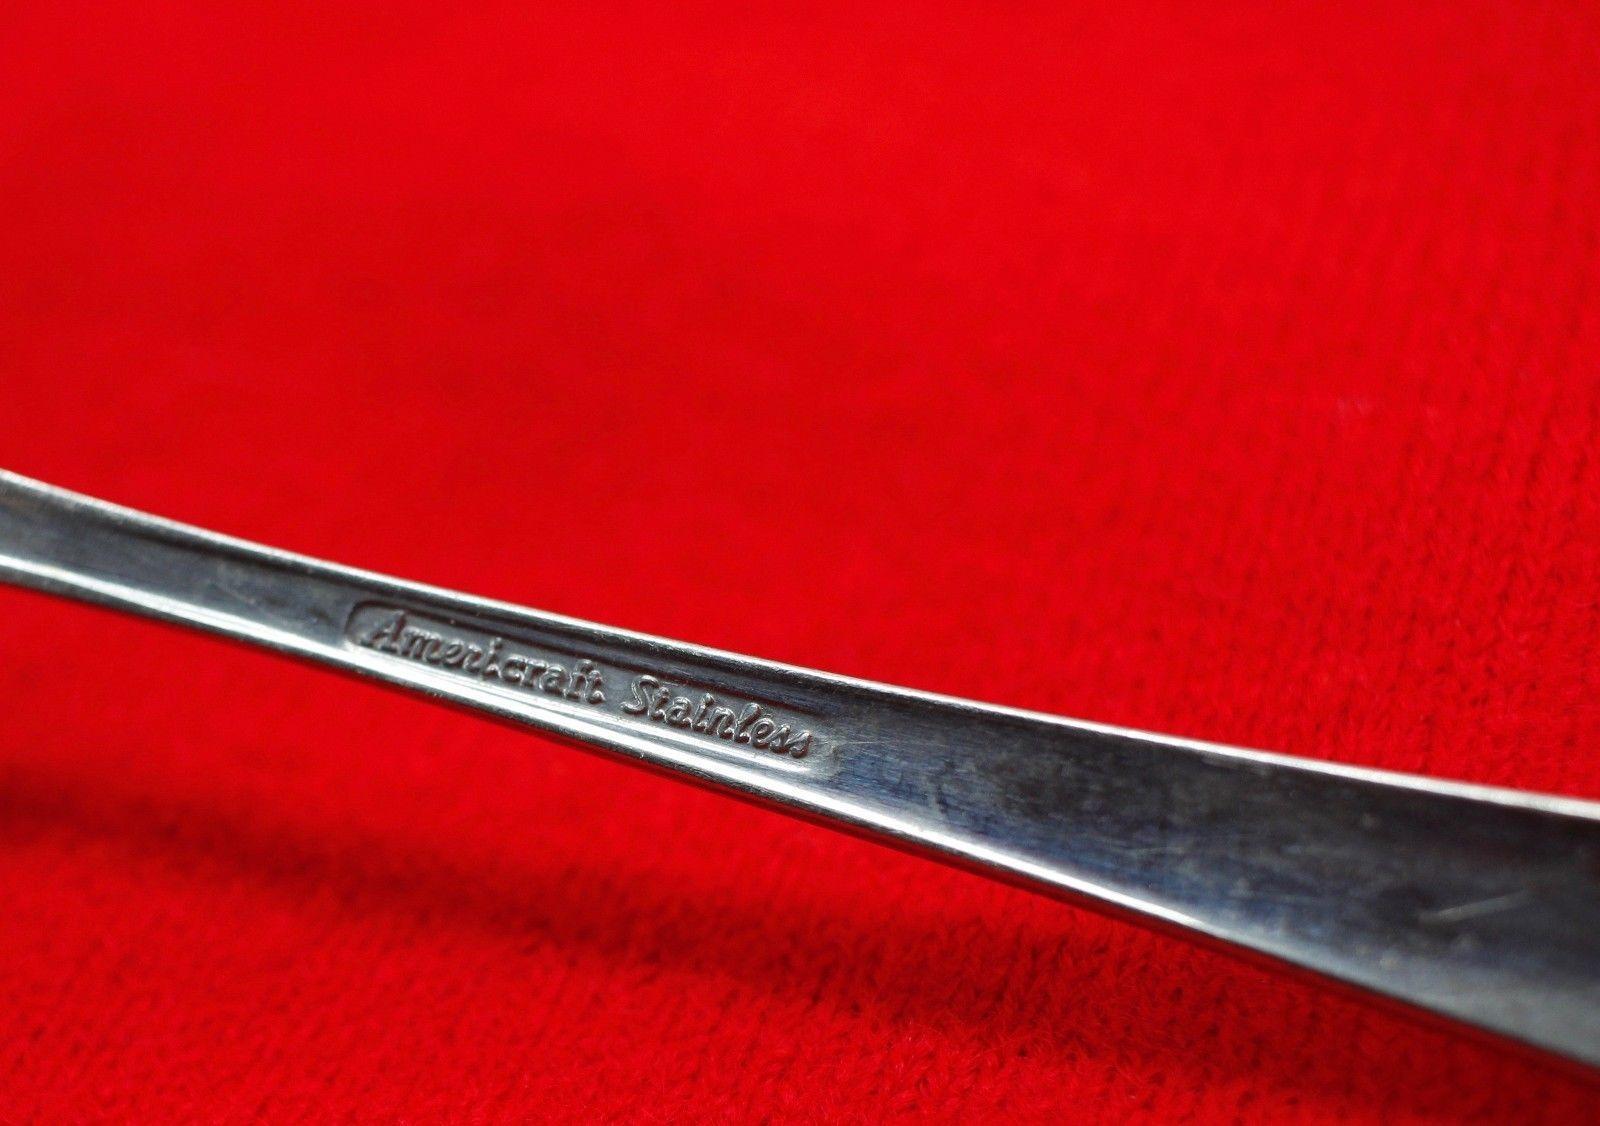 "2X Salad Dessert Forks Gorham Silver Lisa Stainless Glossy Flatware 6 5/8"" Fork"